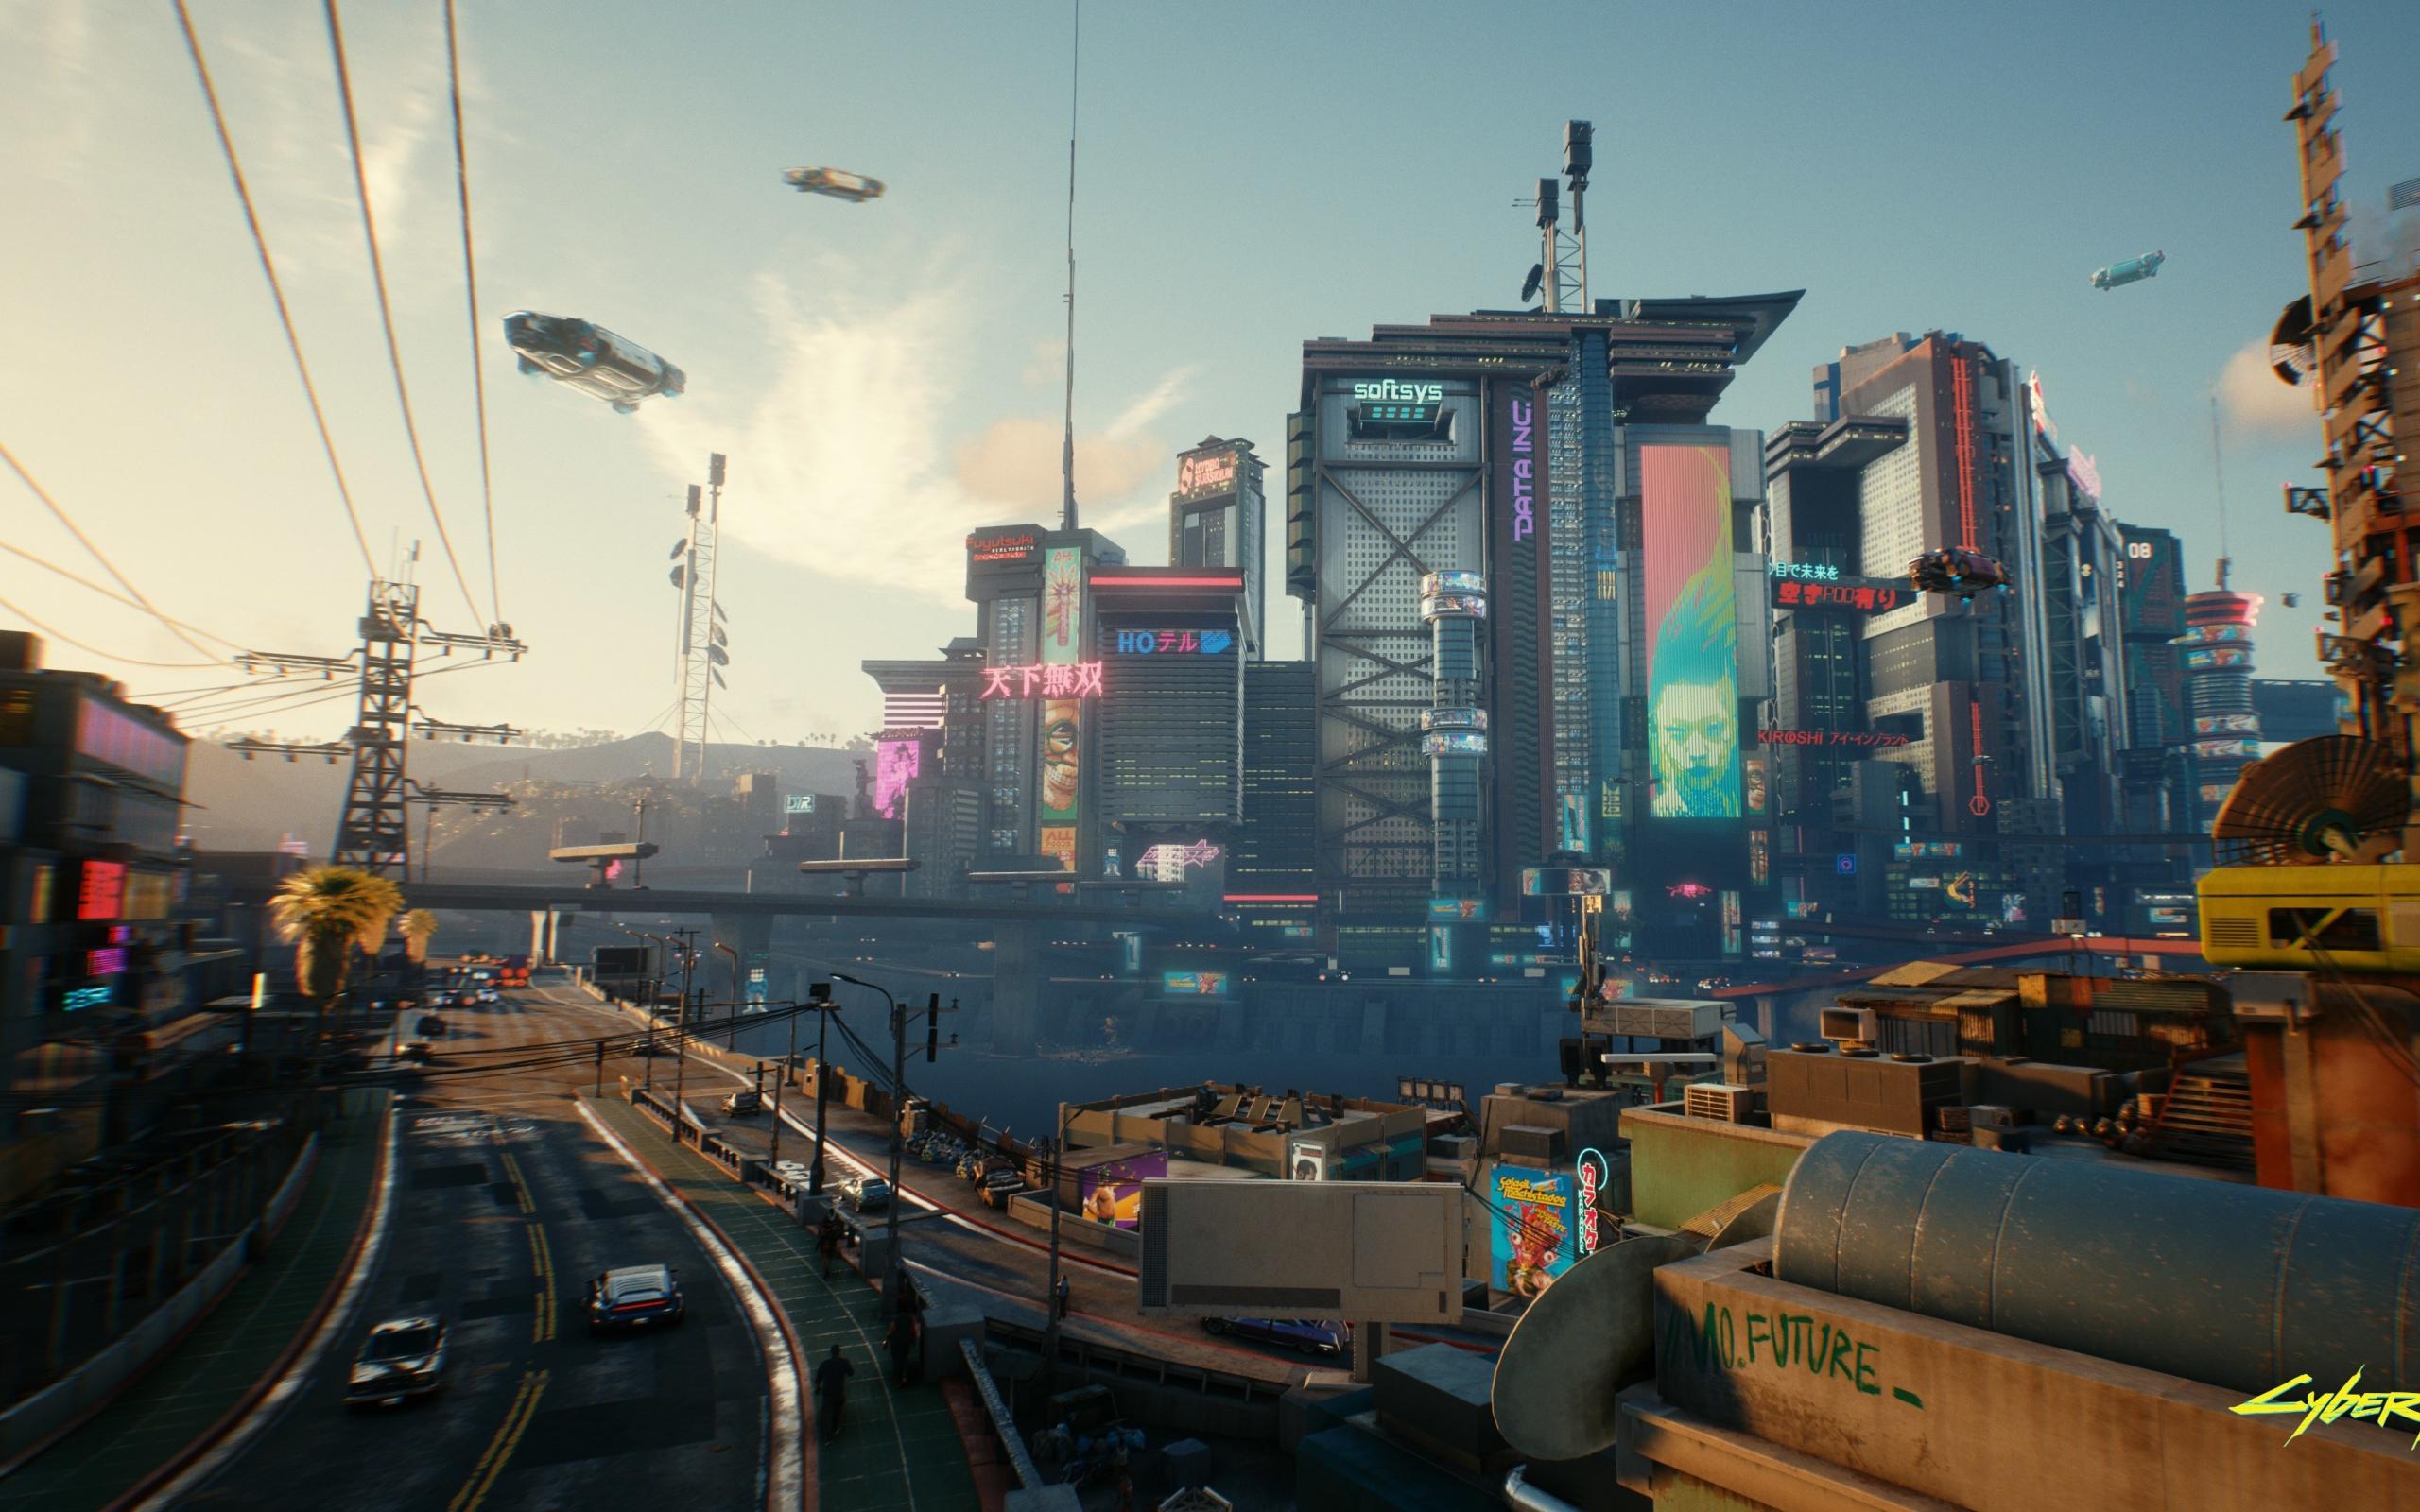 2560x1600 Cyberpunk 2077 Samurai City 2560x1600 Resolution ...